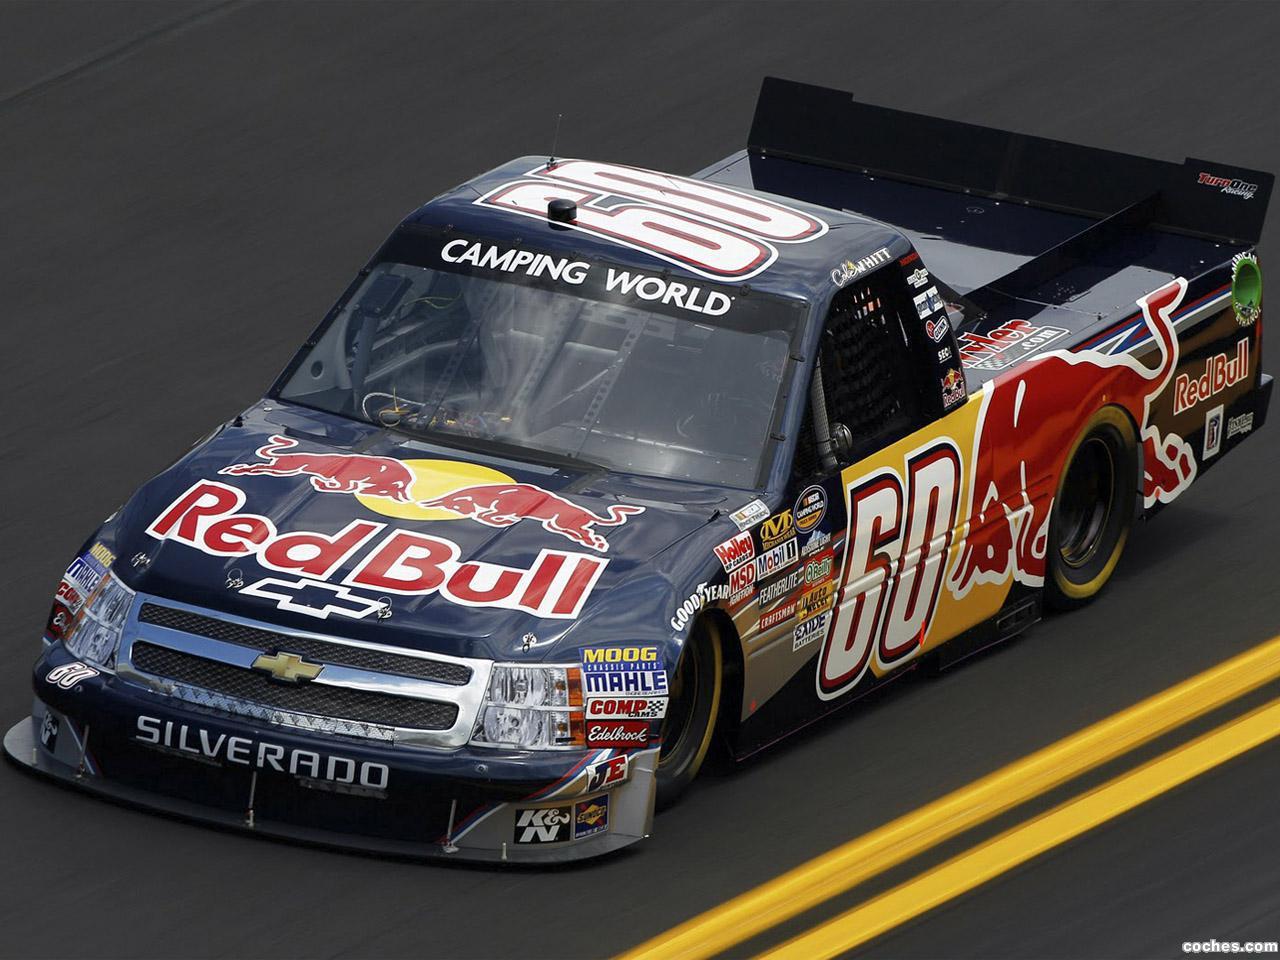 Foto 0 de Chevrolet Silverado NASCAR Camping World Series Tr 2013